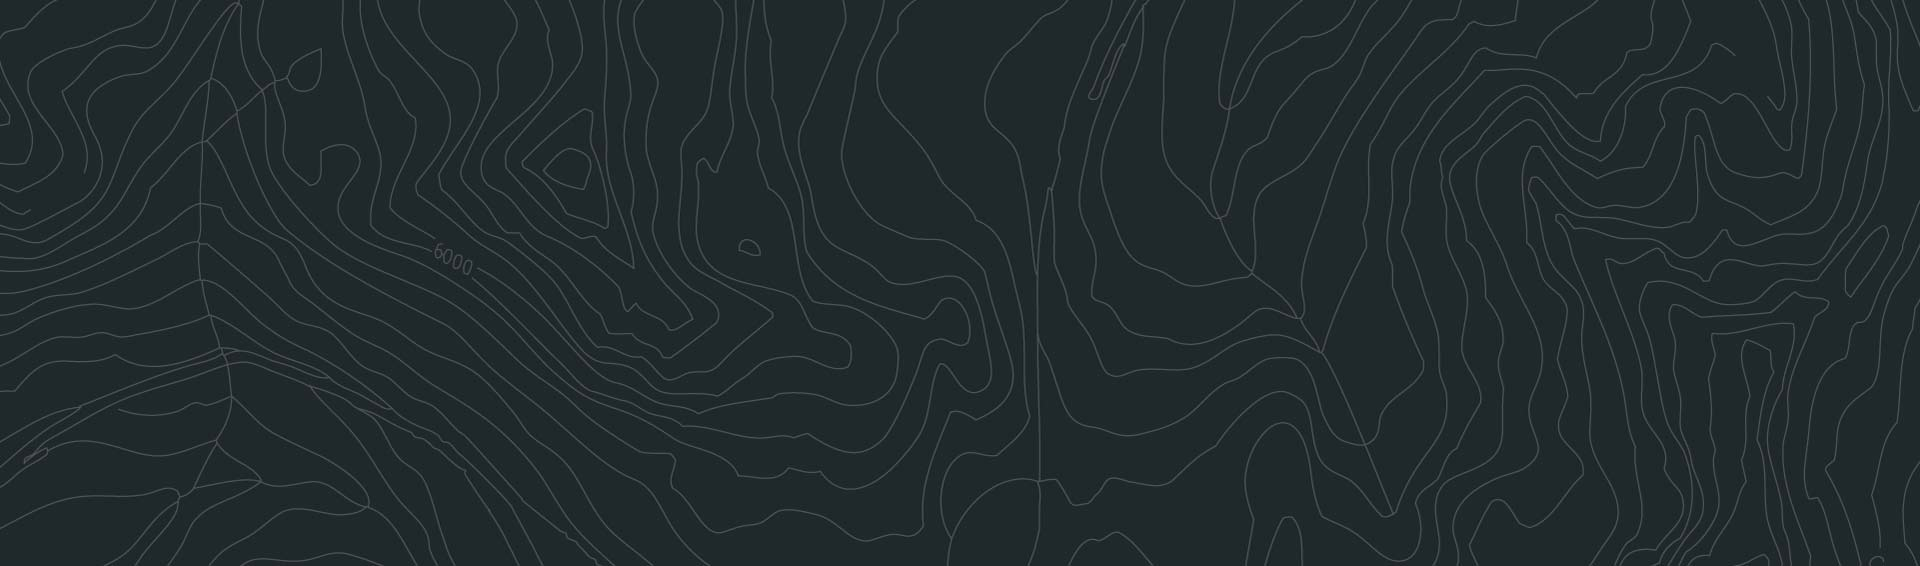 topography-white-on-grey.jpg